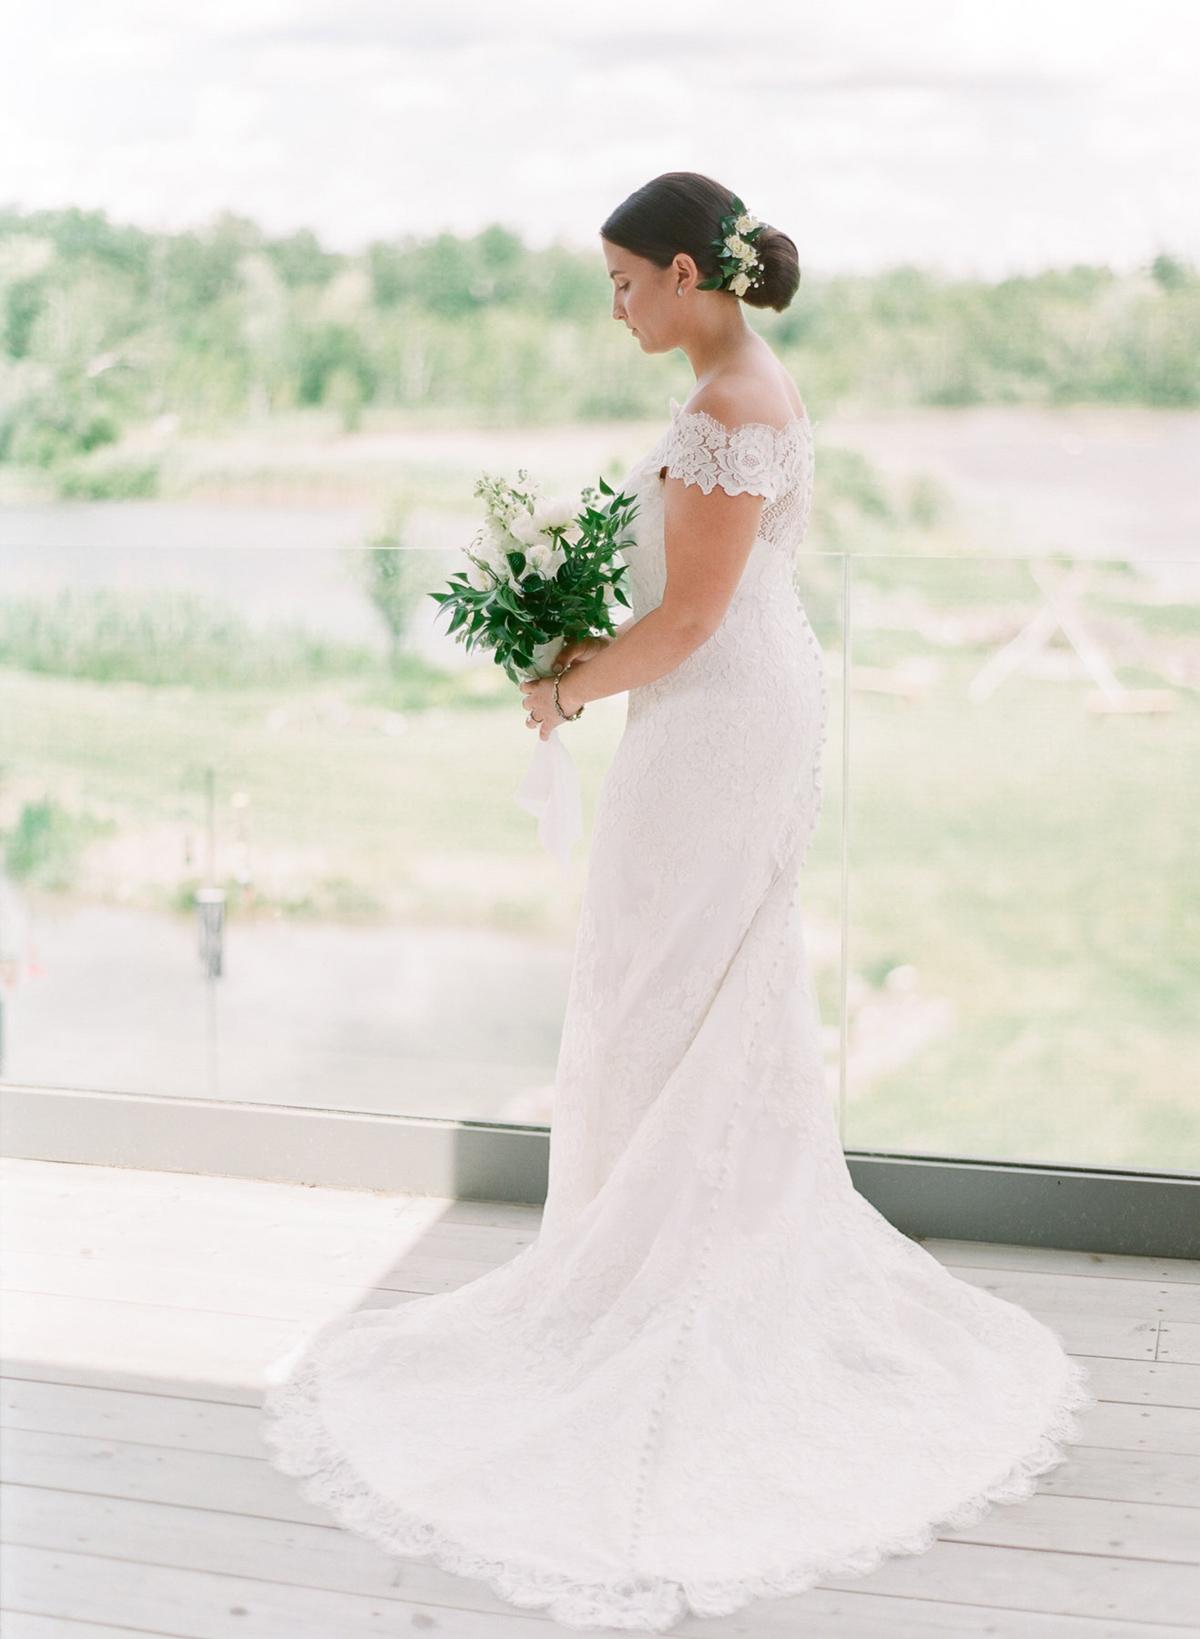 artiese-studios-vineyard-bride-swish-list-private-estate-cambridge-wedding-26.jpg